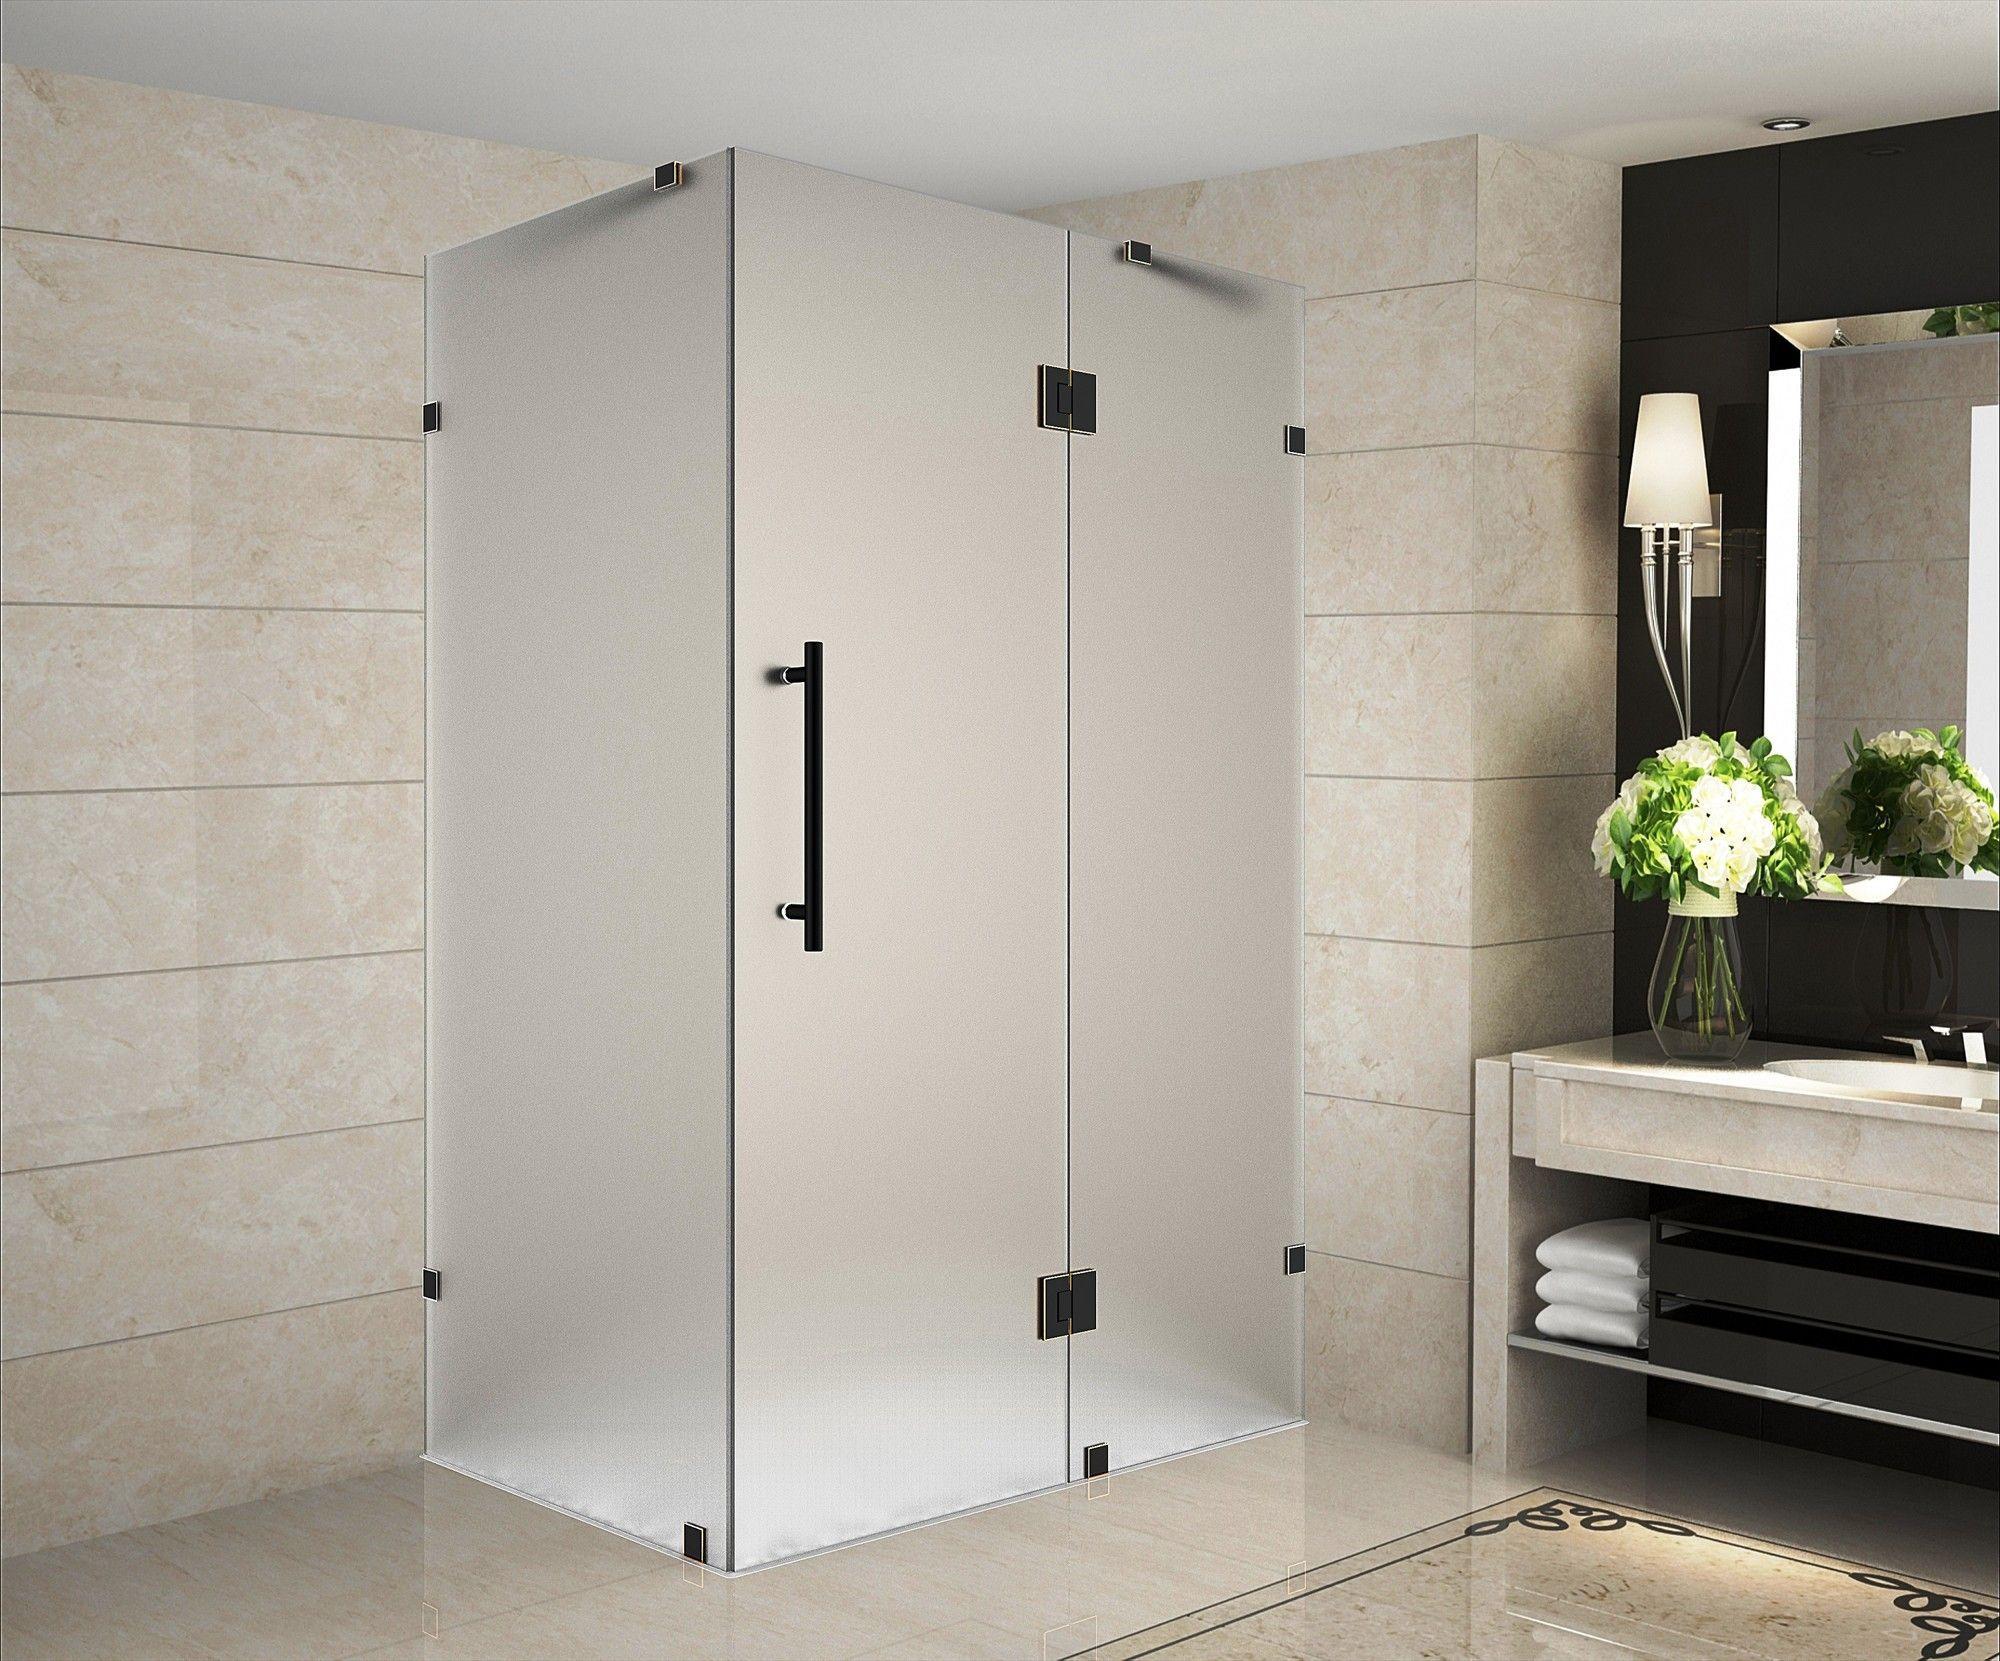 Avalux 32 X 72 Square Hinged Shower Enclosure Shower Enclosure